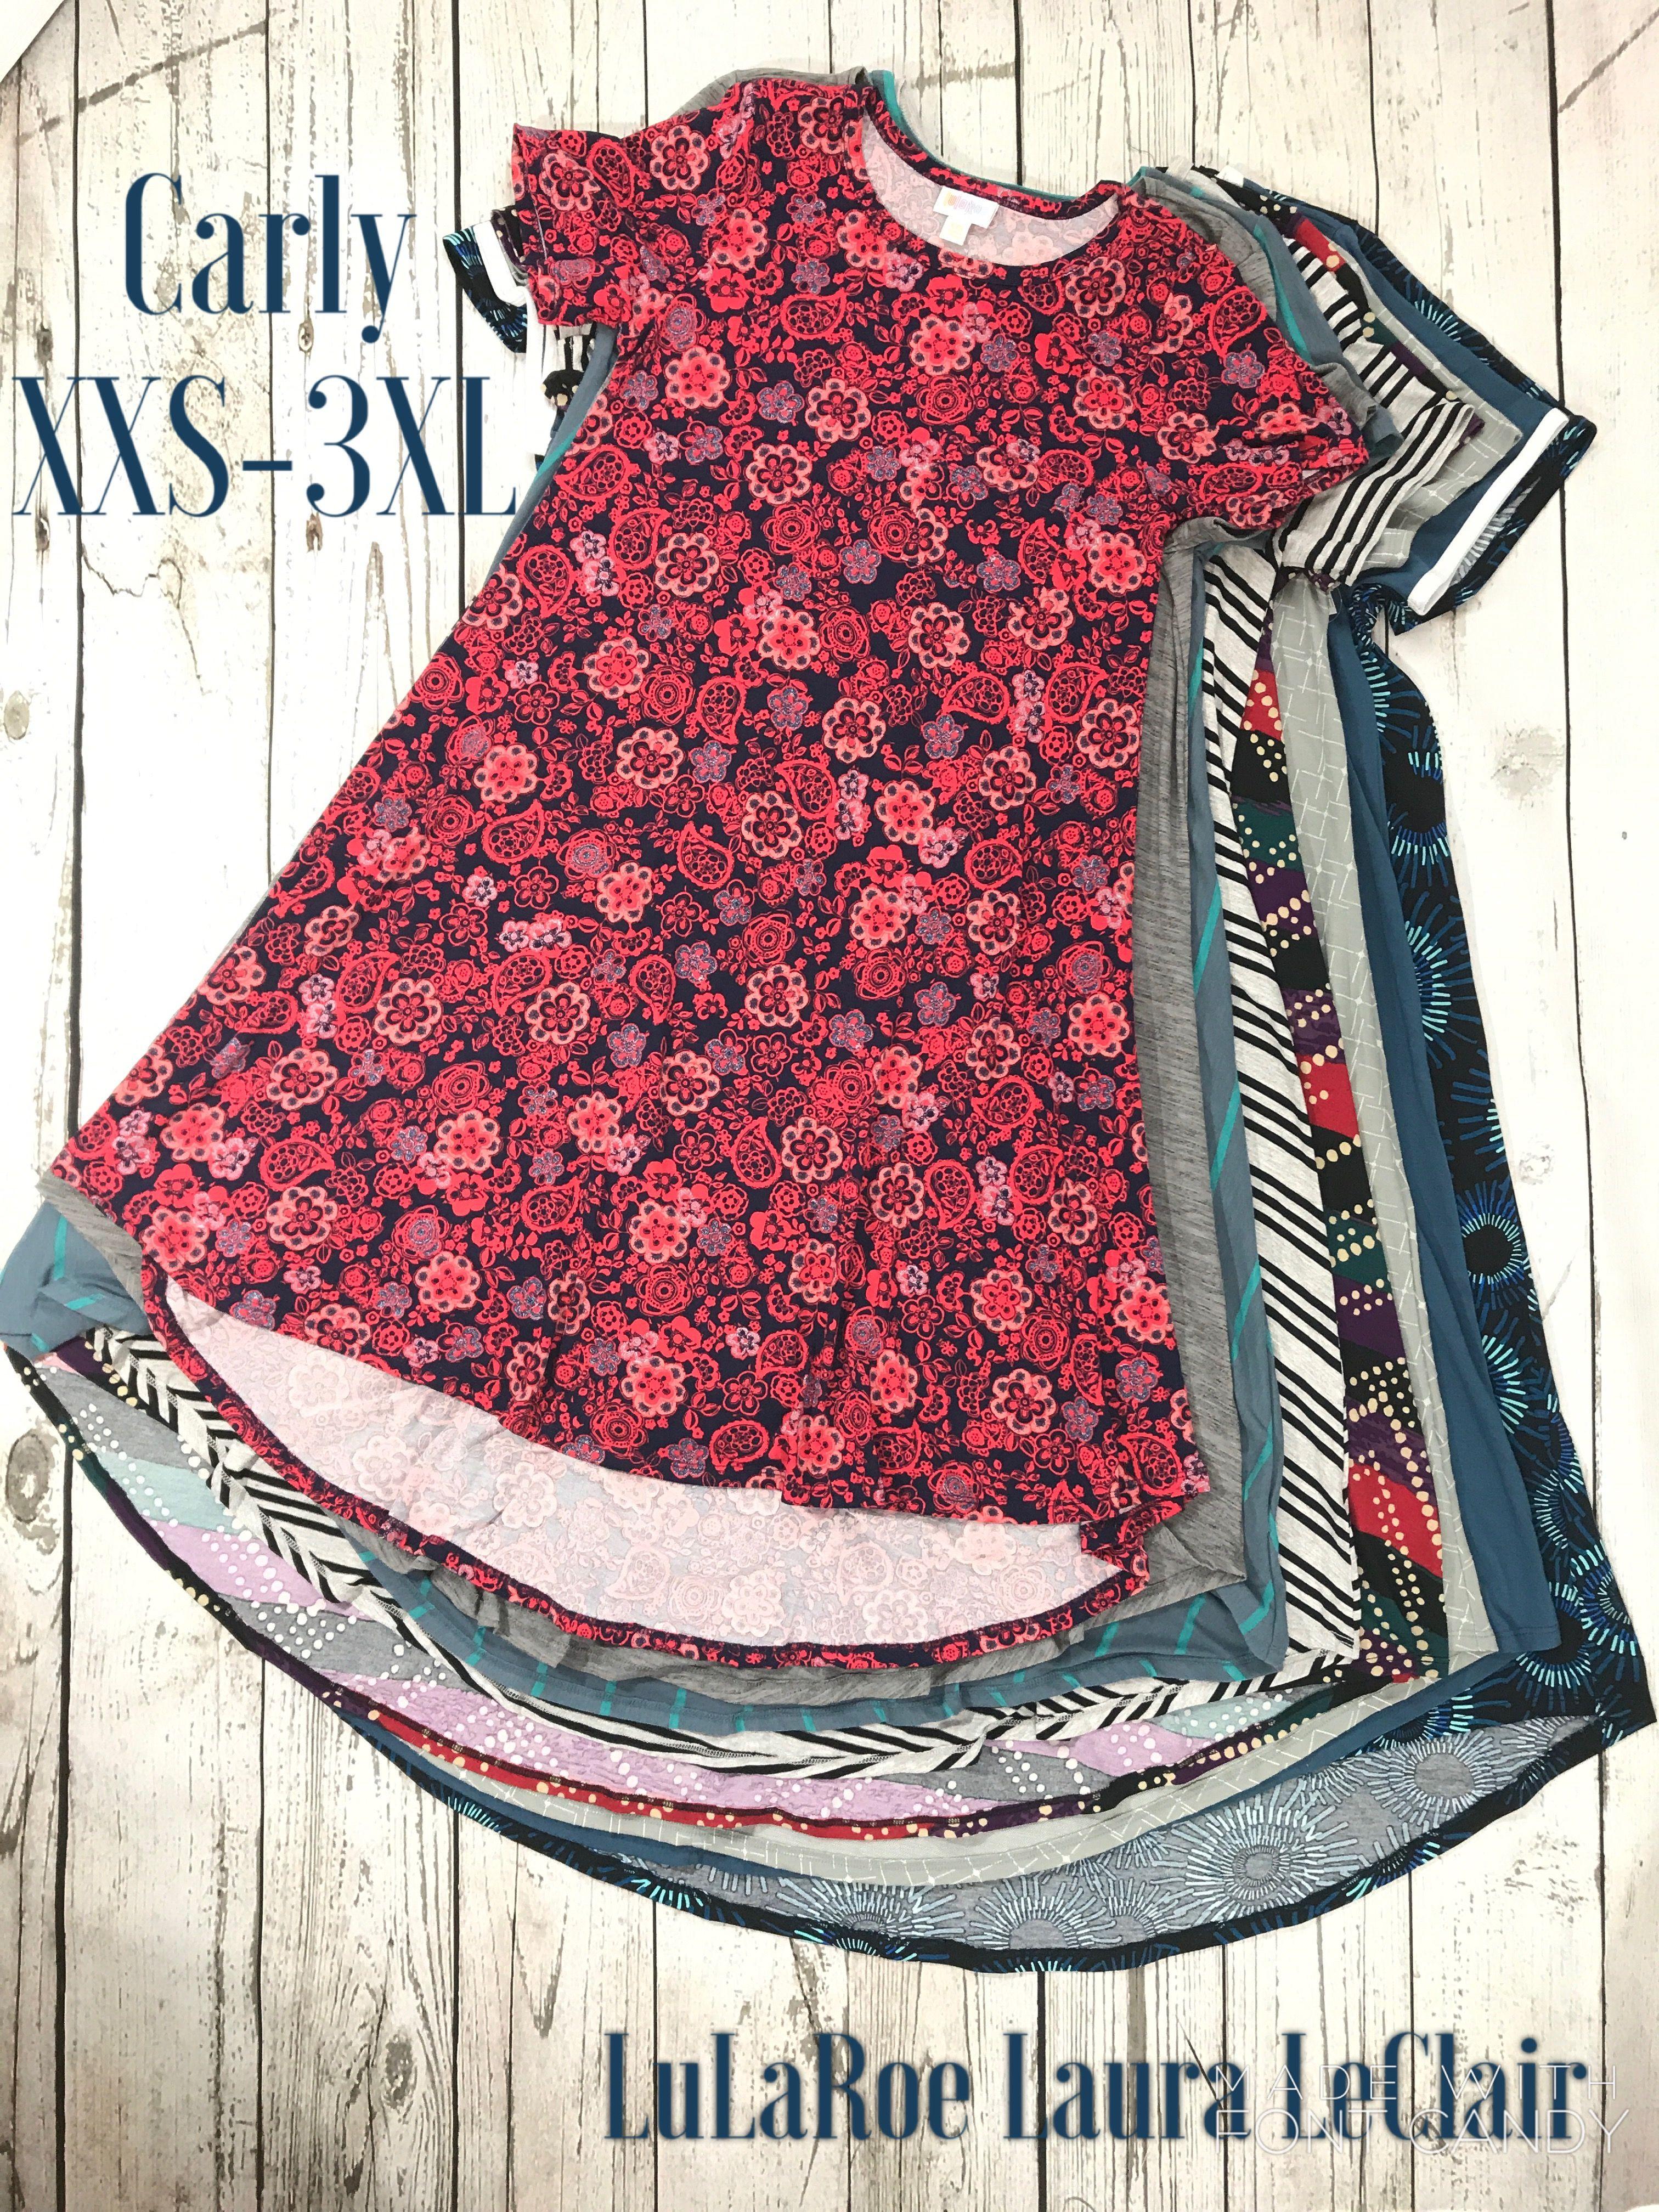 b900c34daa1 LuLaRoe Carly dress sizes xxs-3xl size comparisons